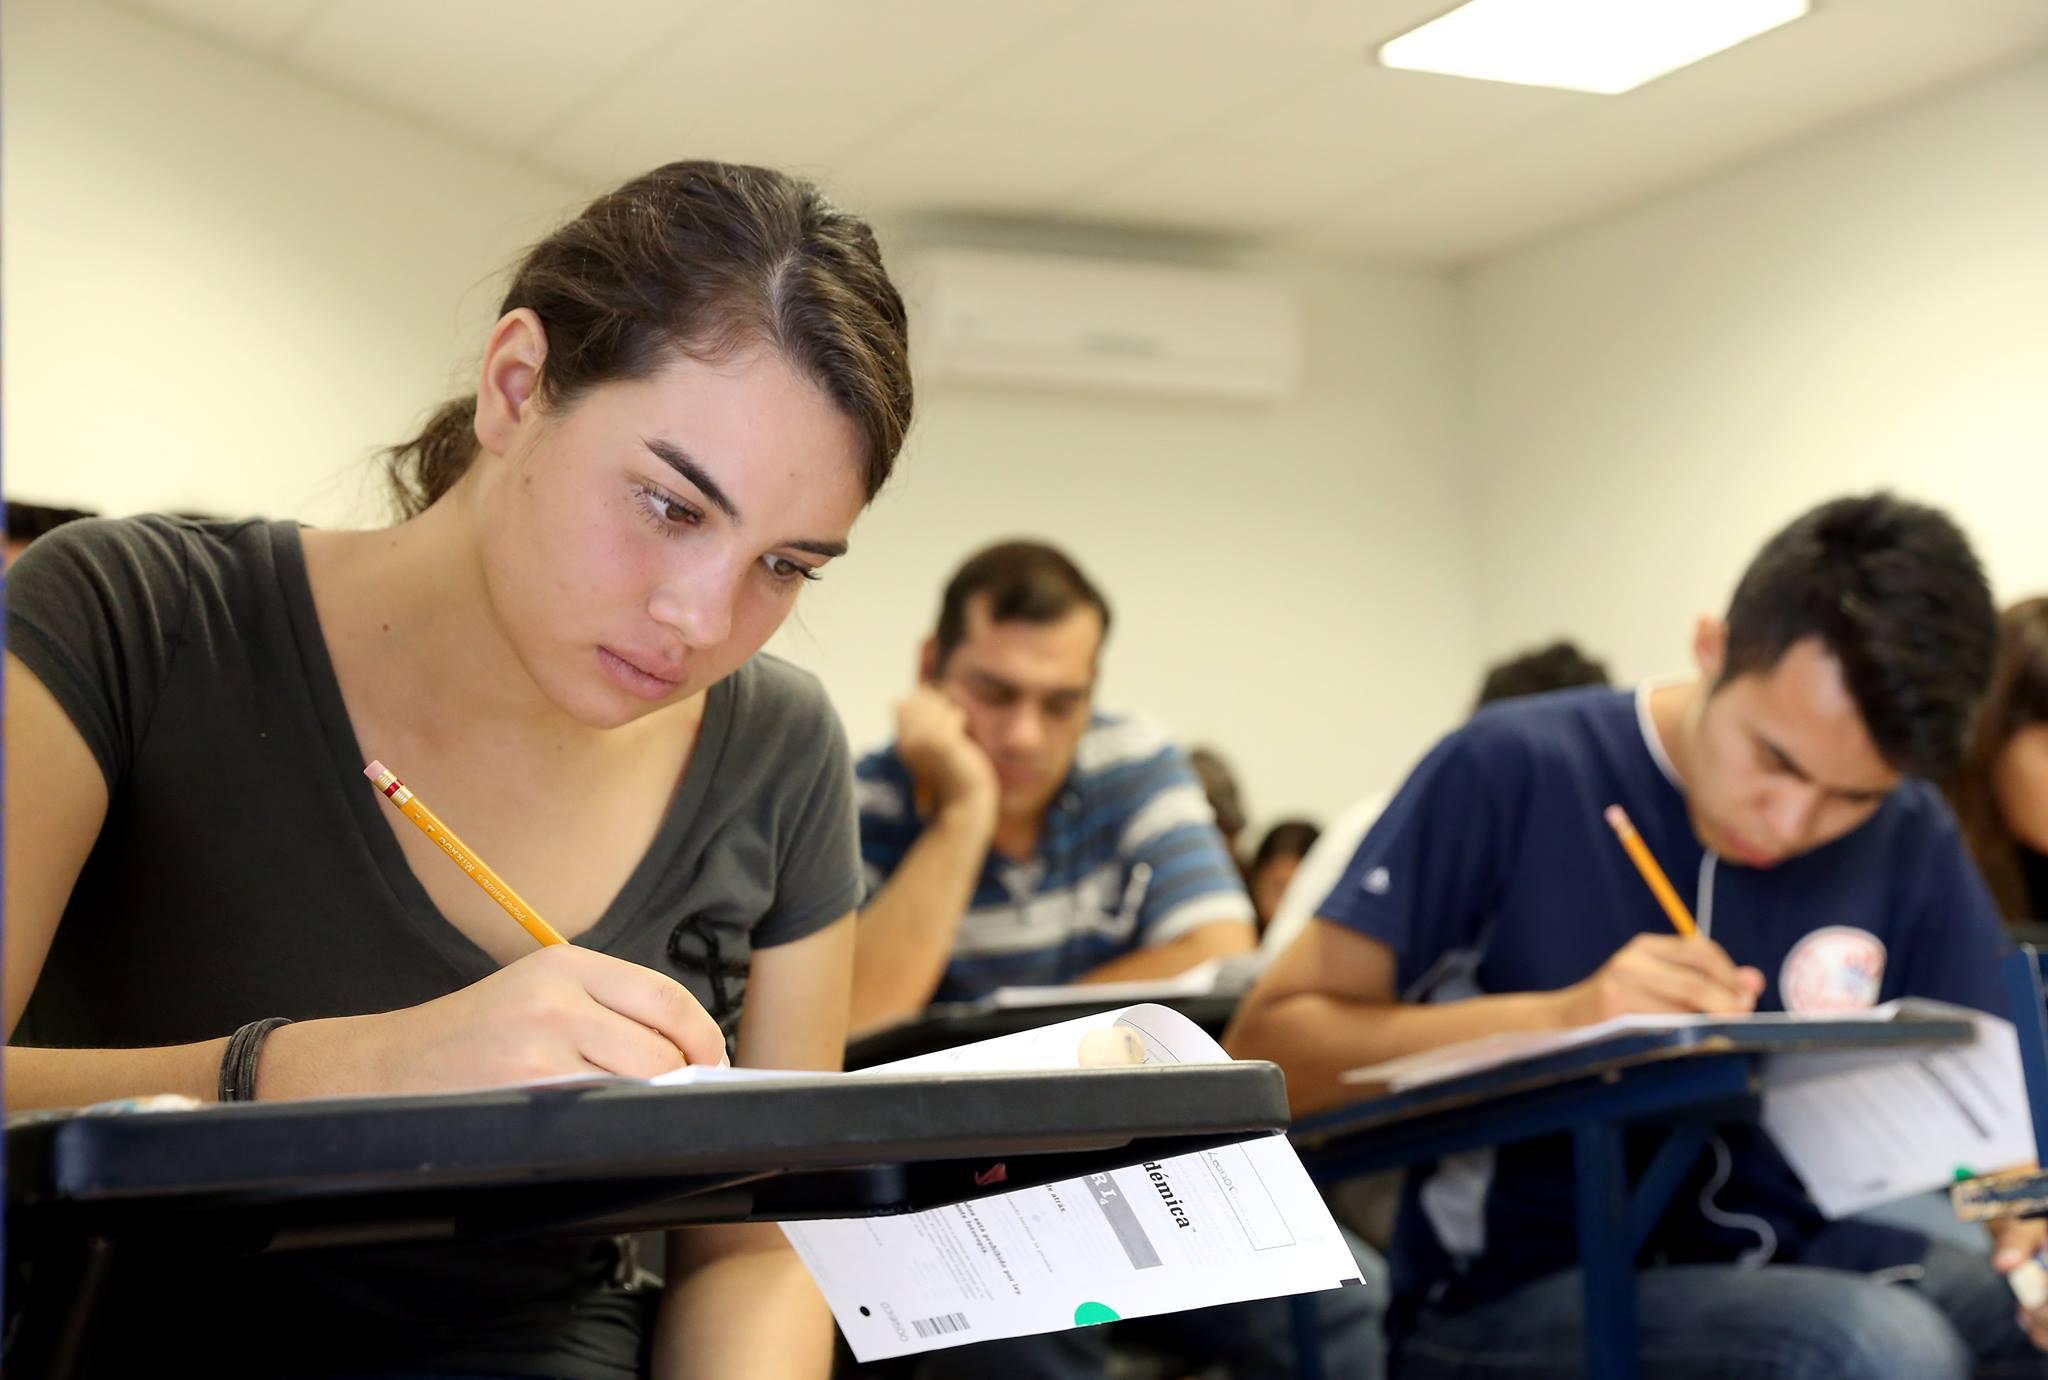 Aspirantes realizando examen de admisión